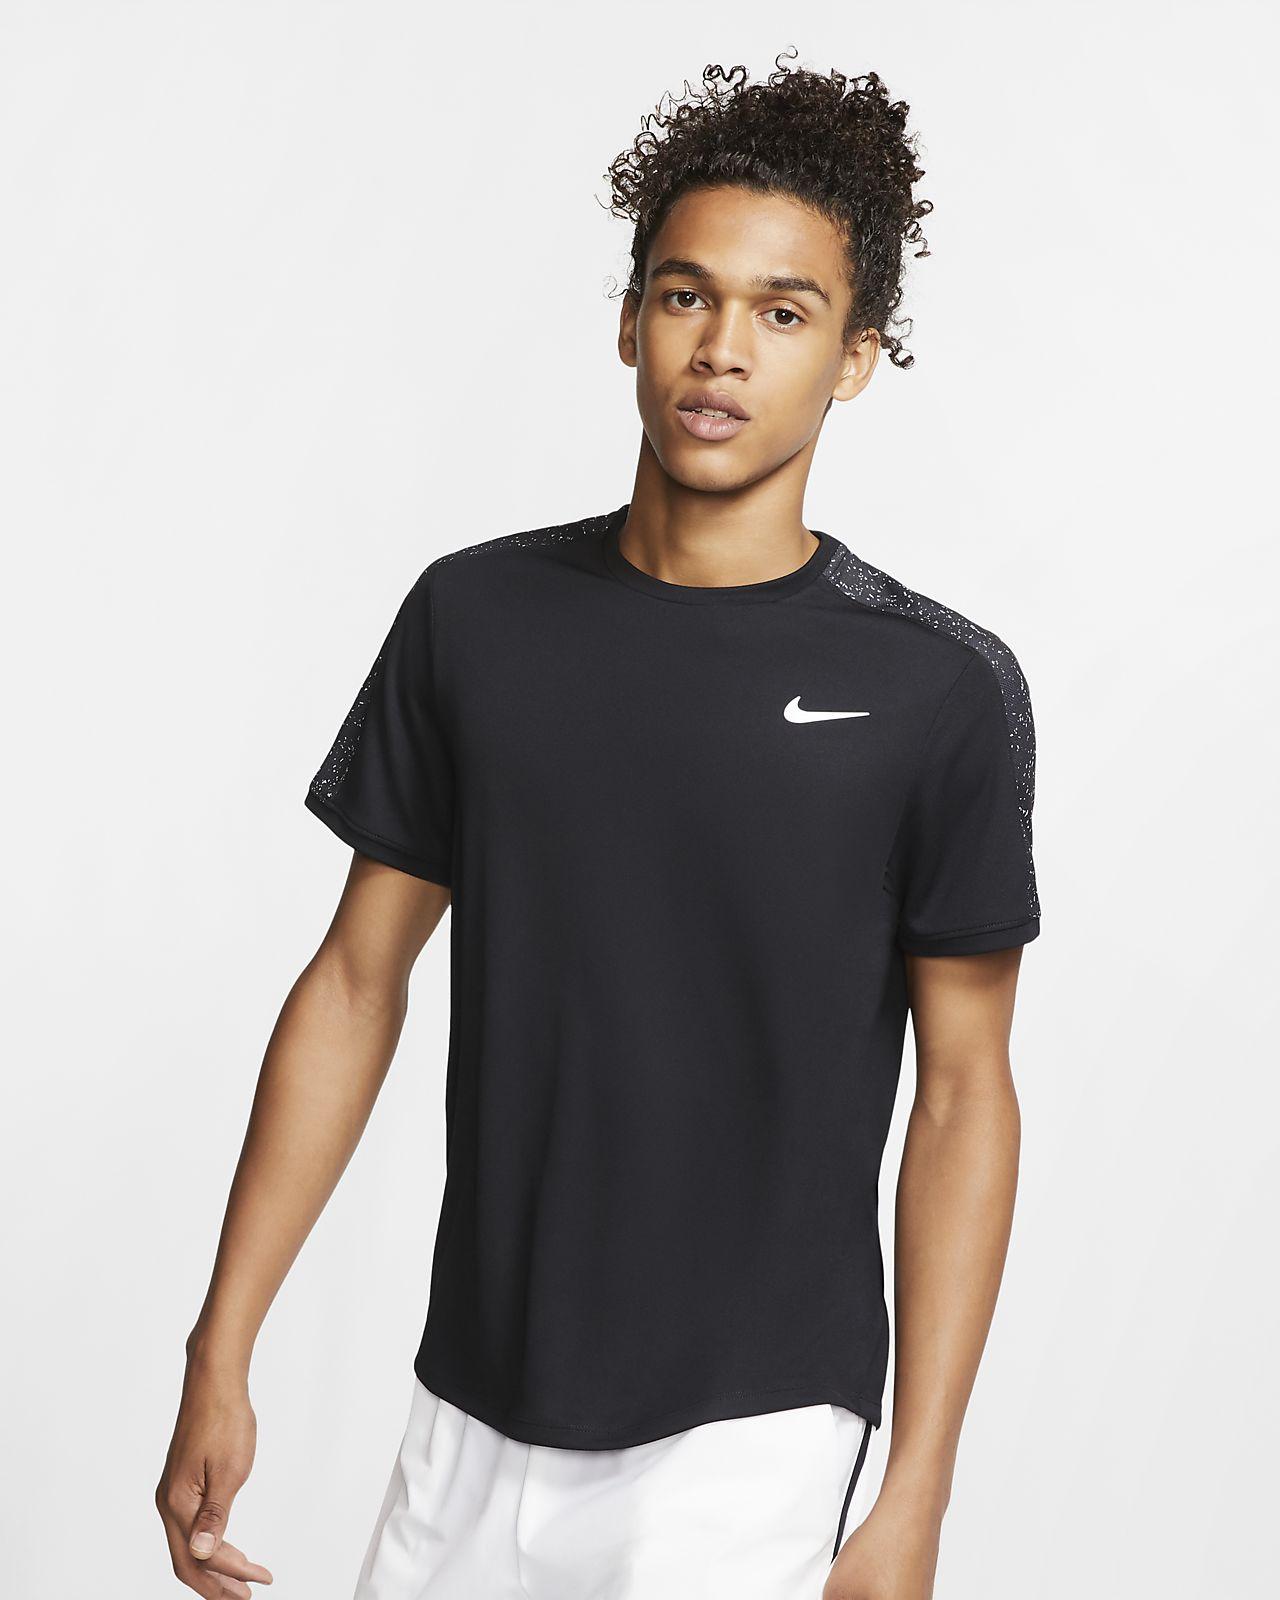 NikeCourt Dri-FIT Men's Short-Sleeve Graphic Tennis Top